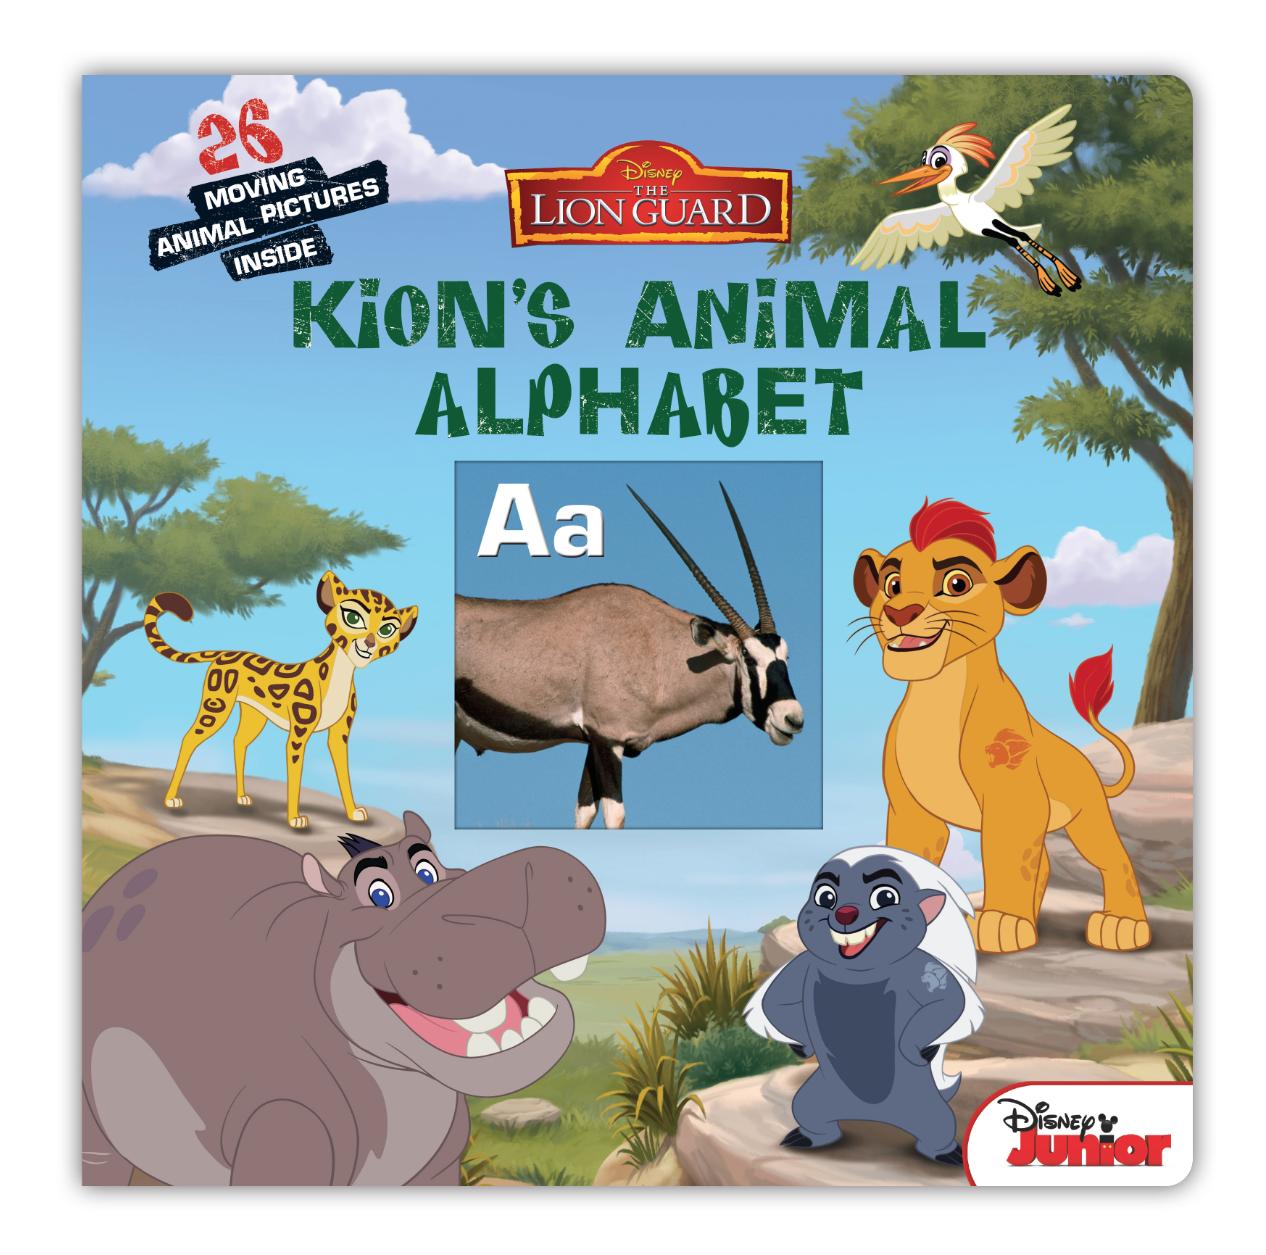 The Lion Guard: Kion's Animal Alphabet